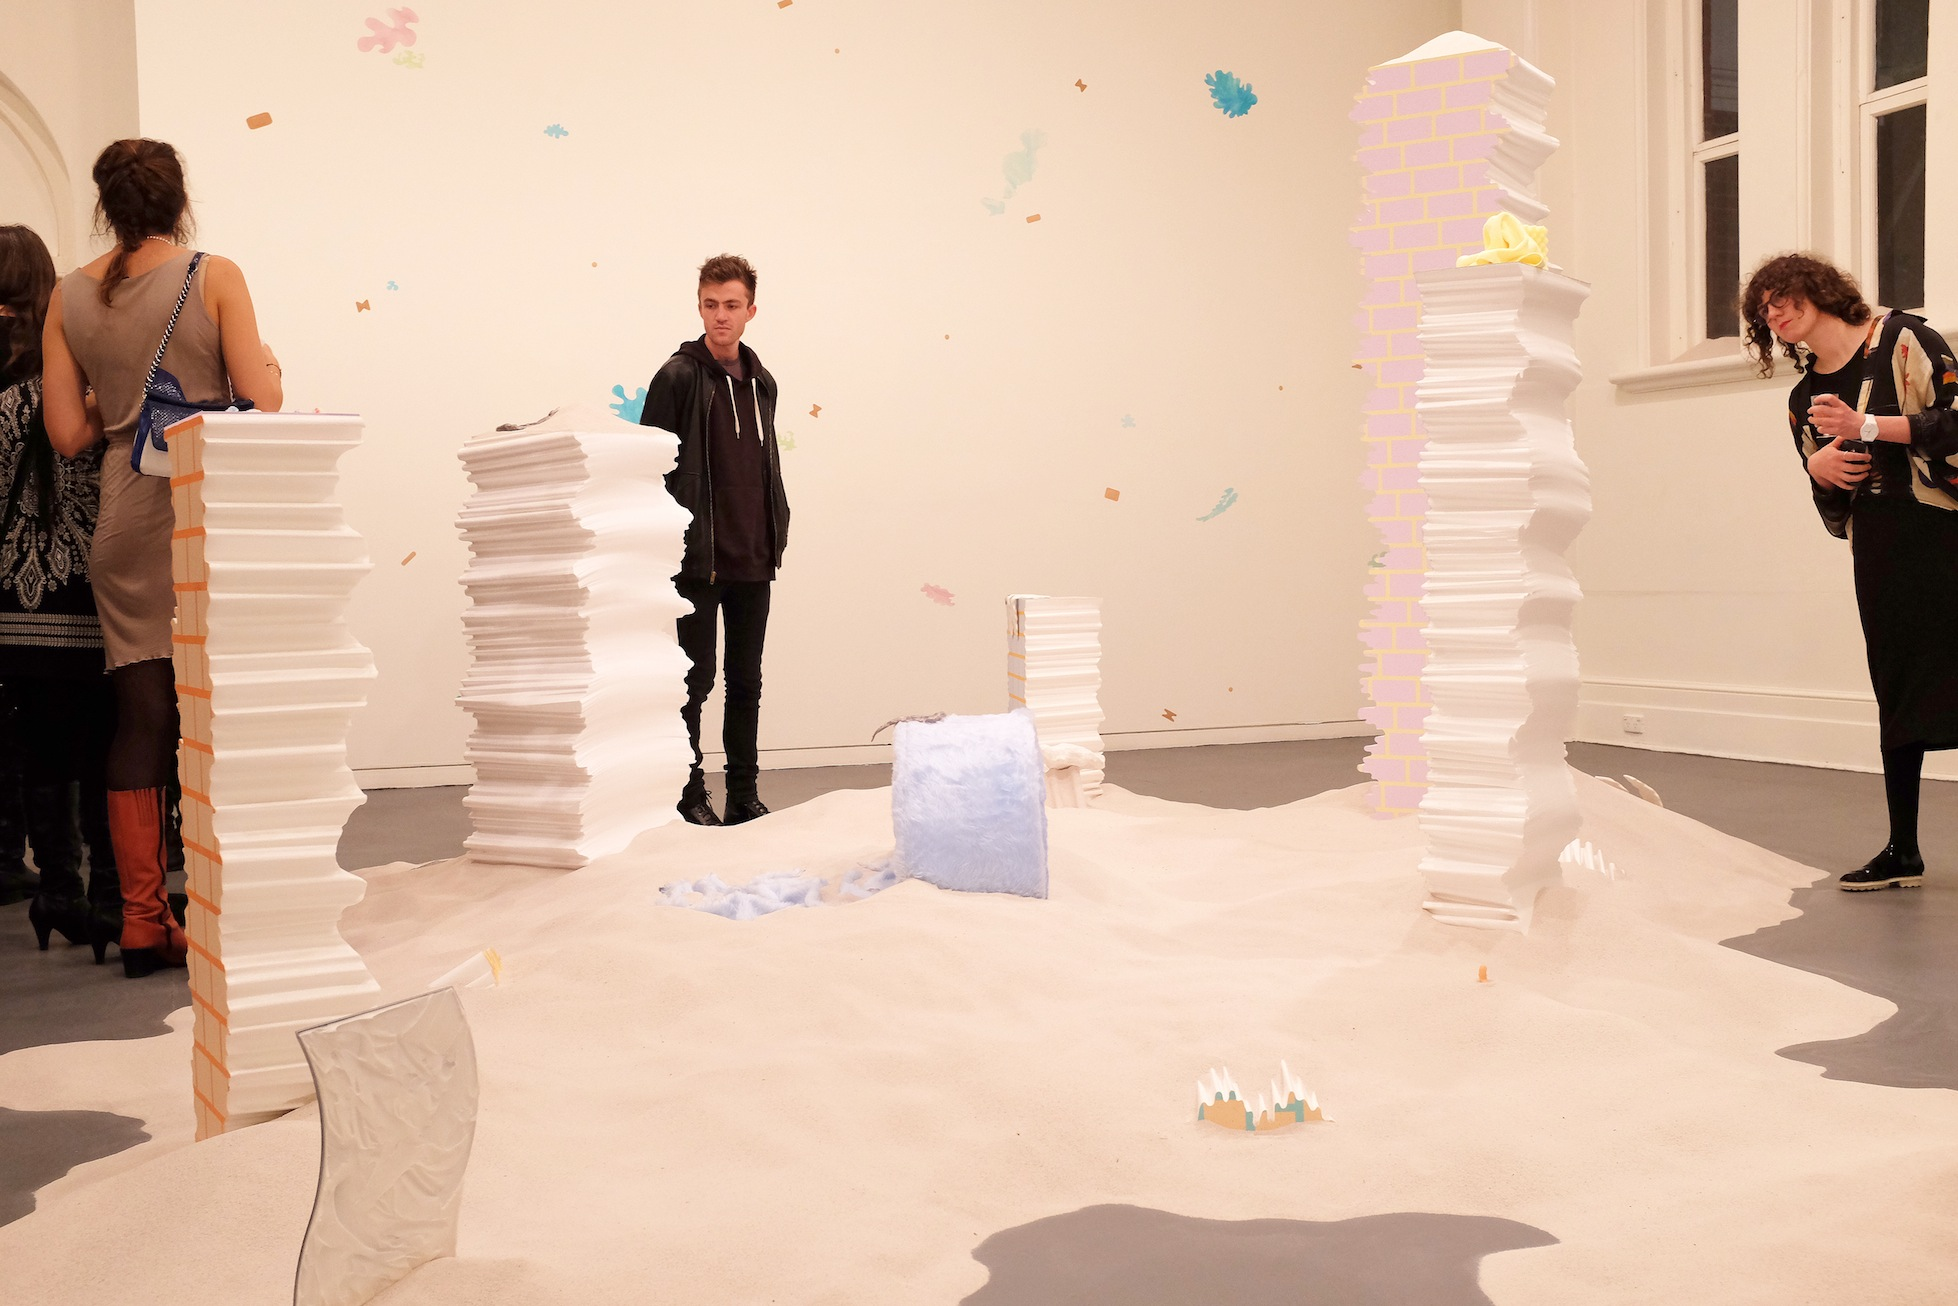 hatched 2014, art, art exhibition, australian art, national graduate show, visual arts, media arts, design, photography, university art, grad show, local art, pica, perth, illustration, creative, perth city